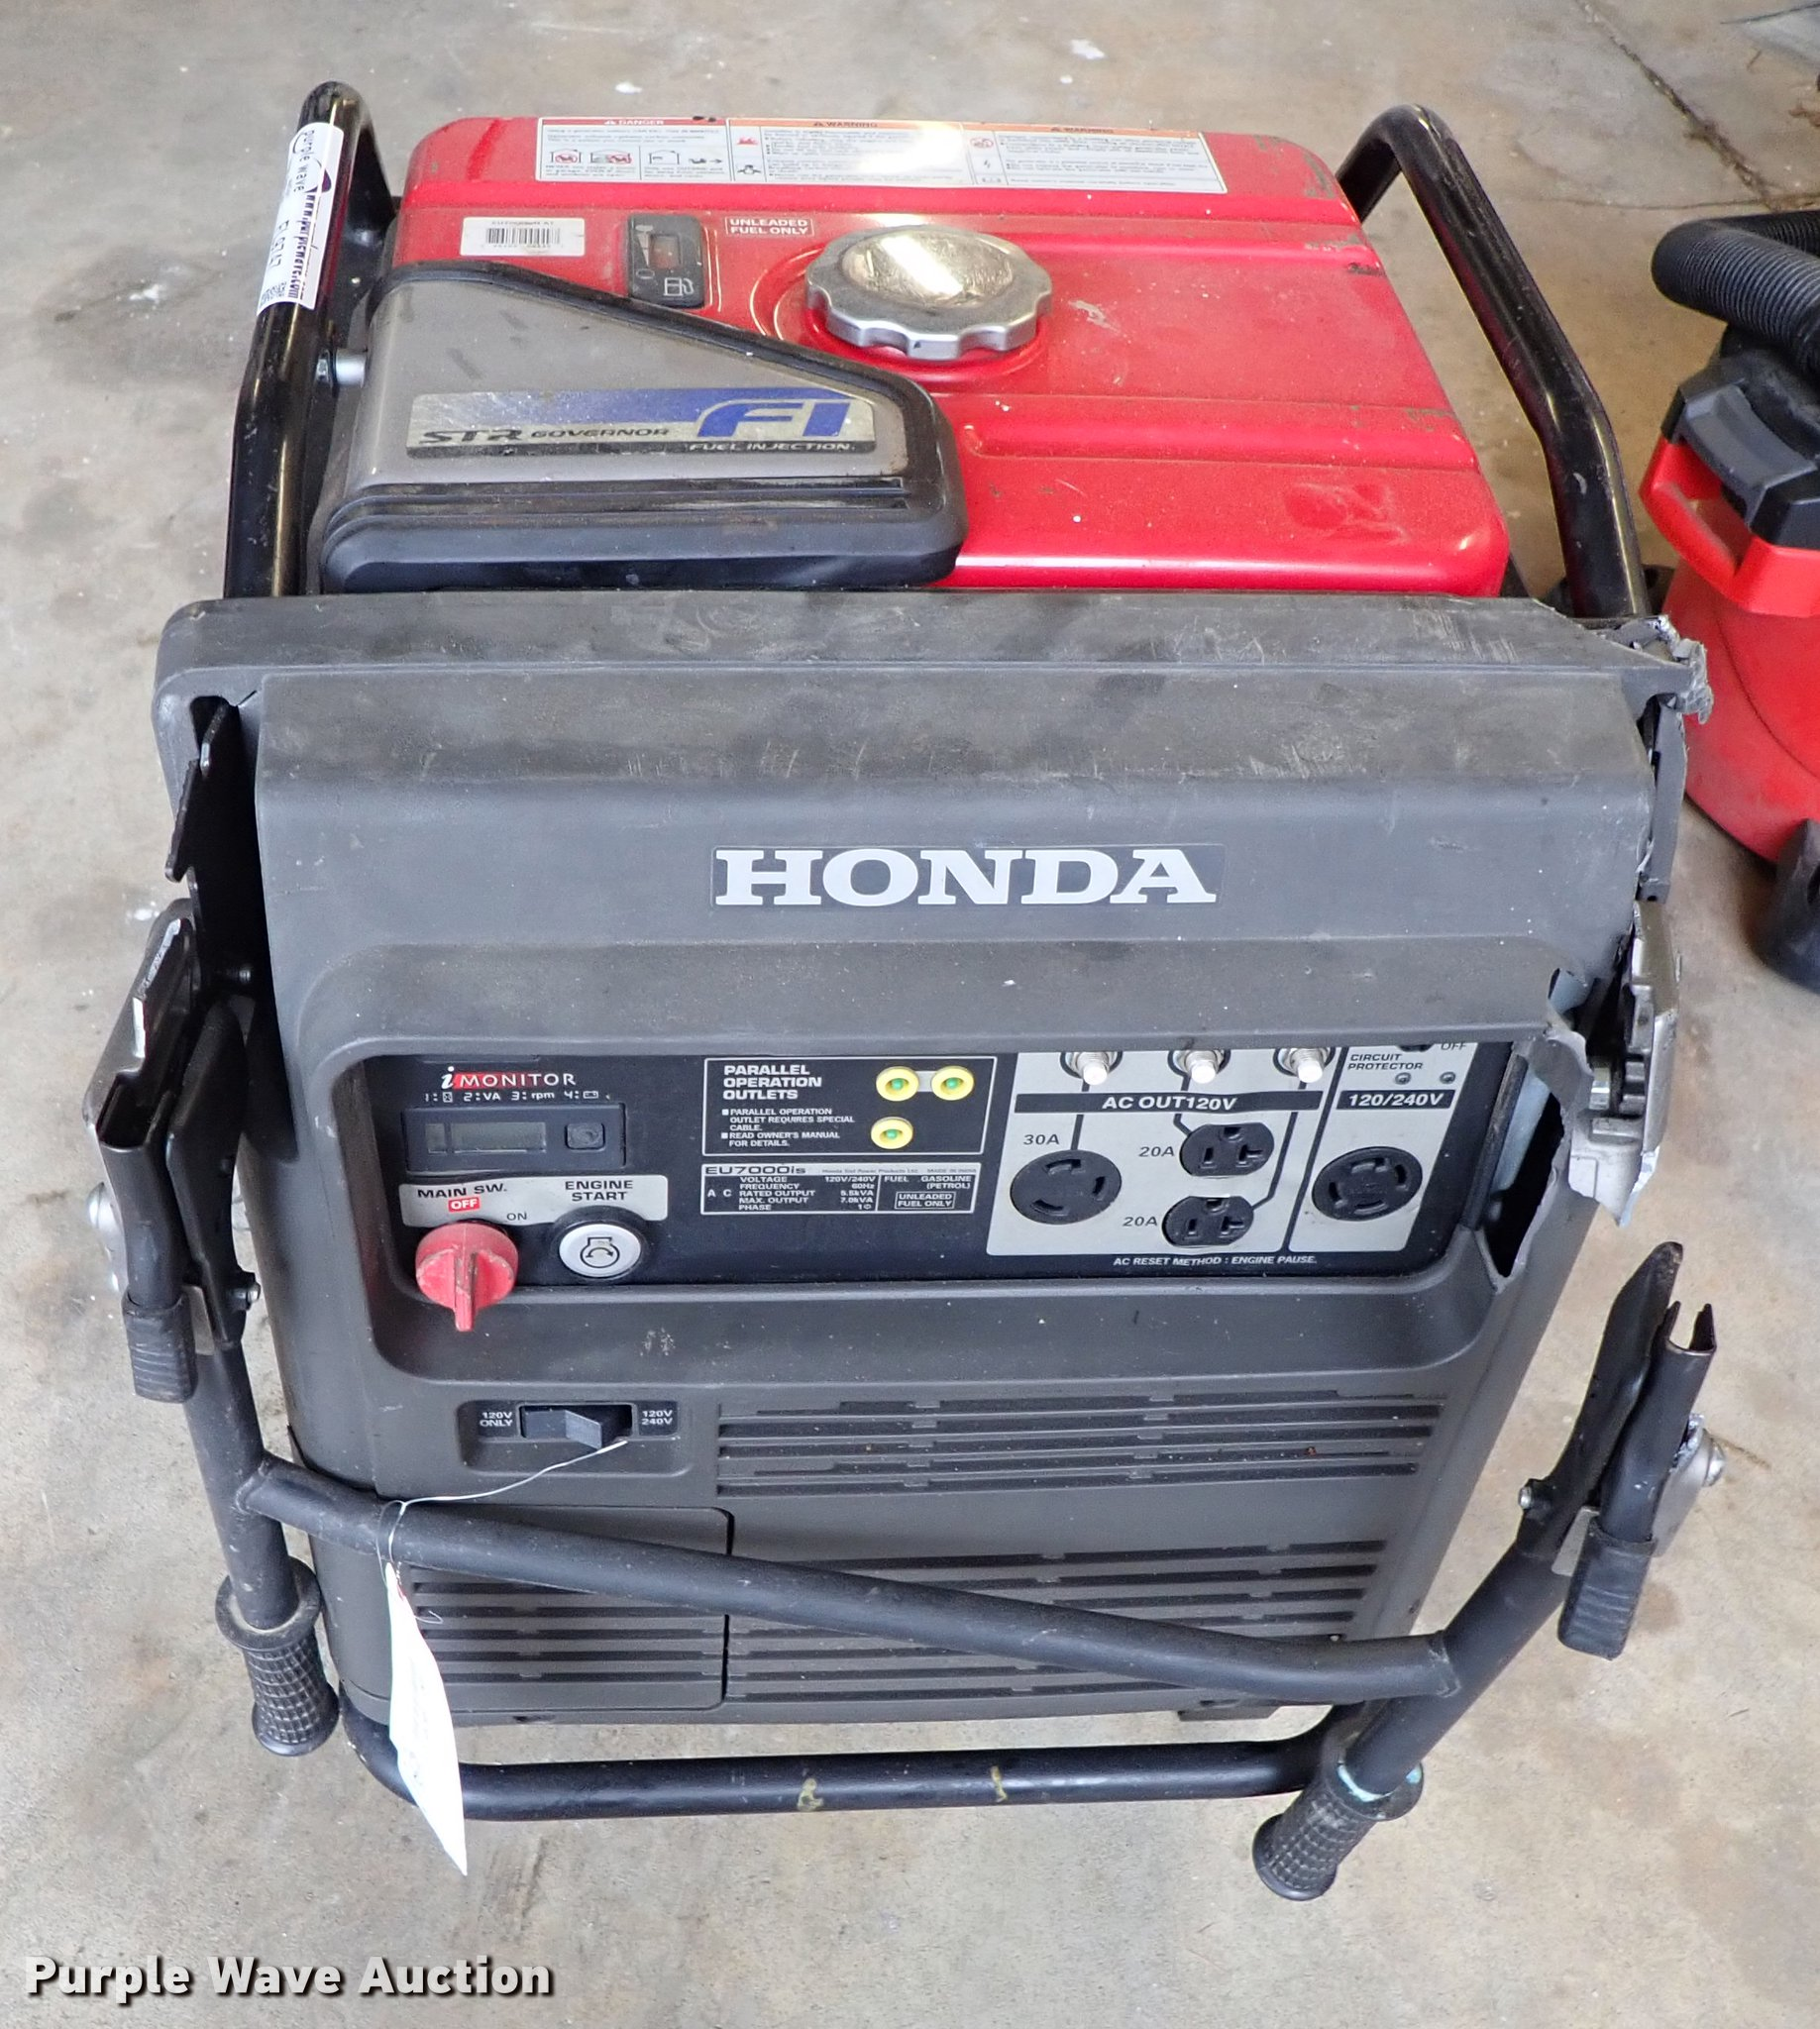 Honda Eu7000is Generator - Page 4 - 2019 honda civic